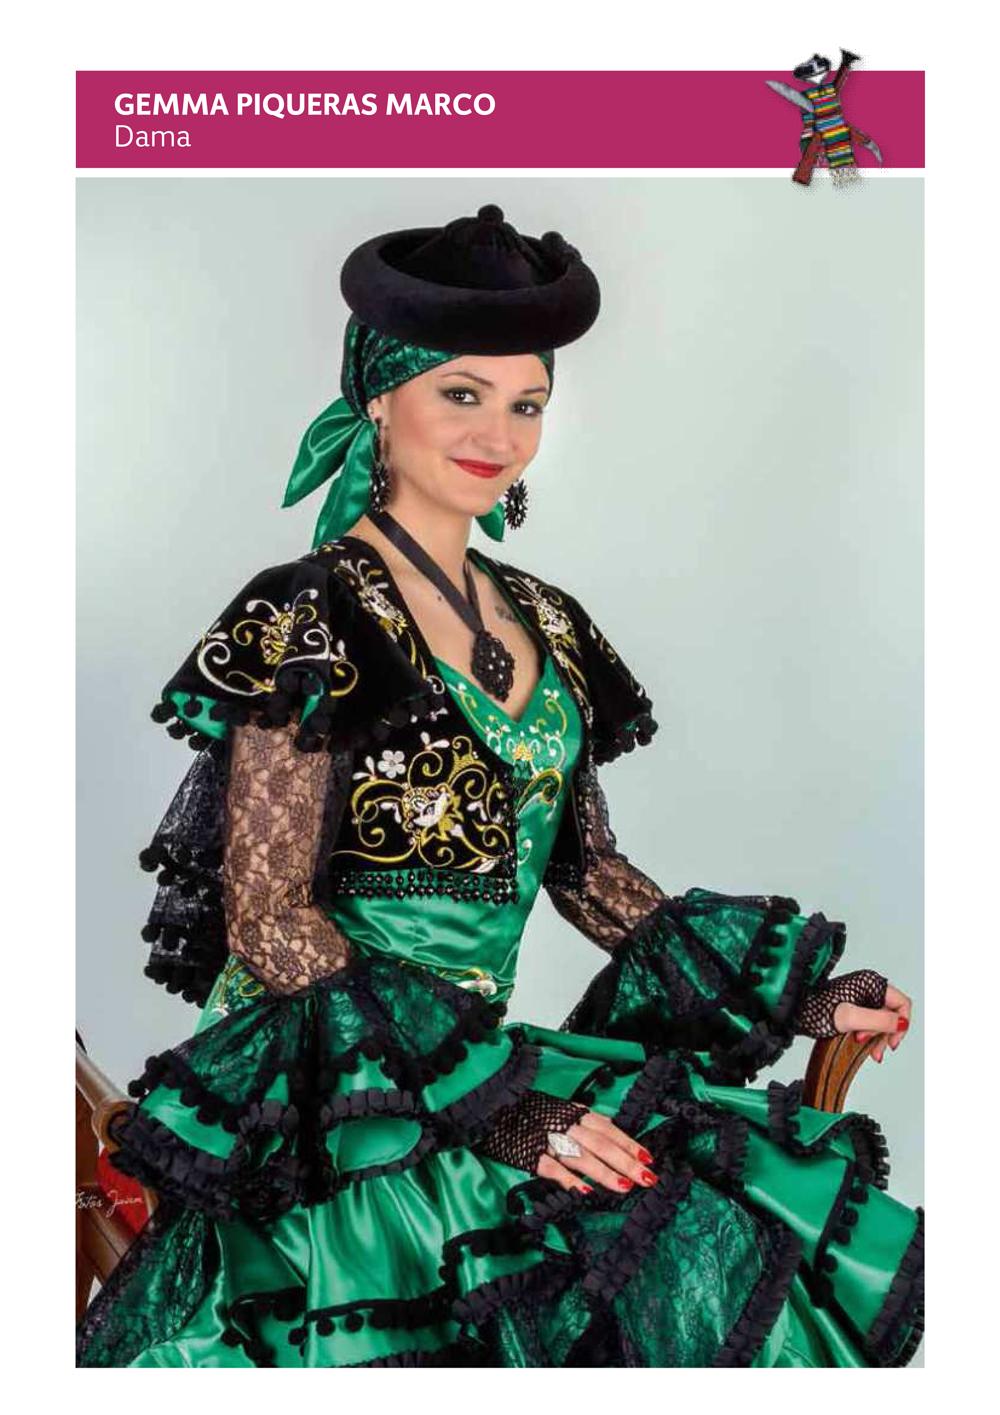 dama 2014 gema piqueras marco